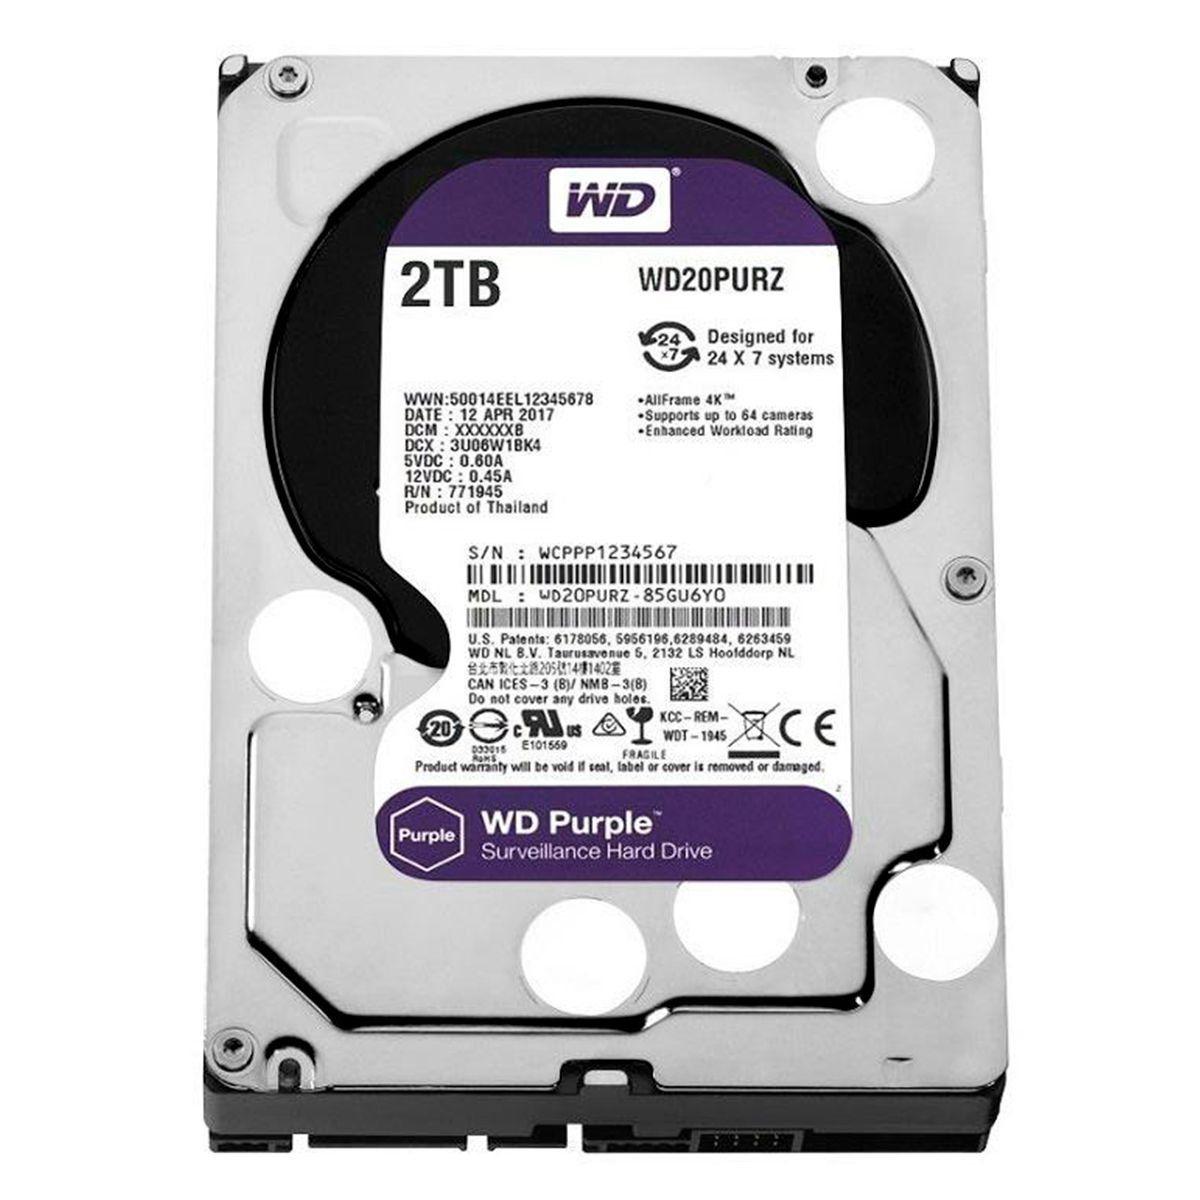 Kit 16 Câmeras de Segurança Intelbras Full HD 1080p VHD 1220B IR + DVR Intelbras Full HD C/ HD 2TB + Acessórios